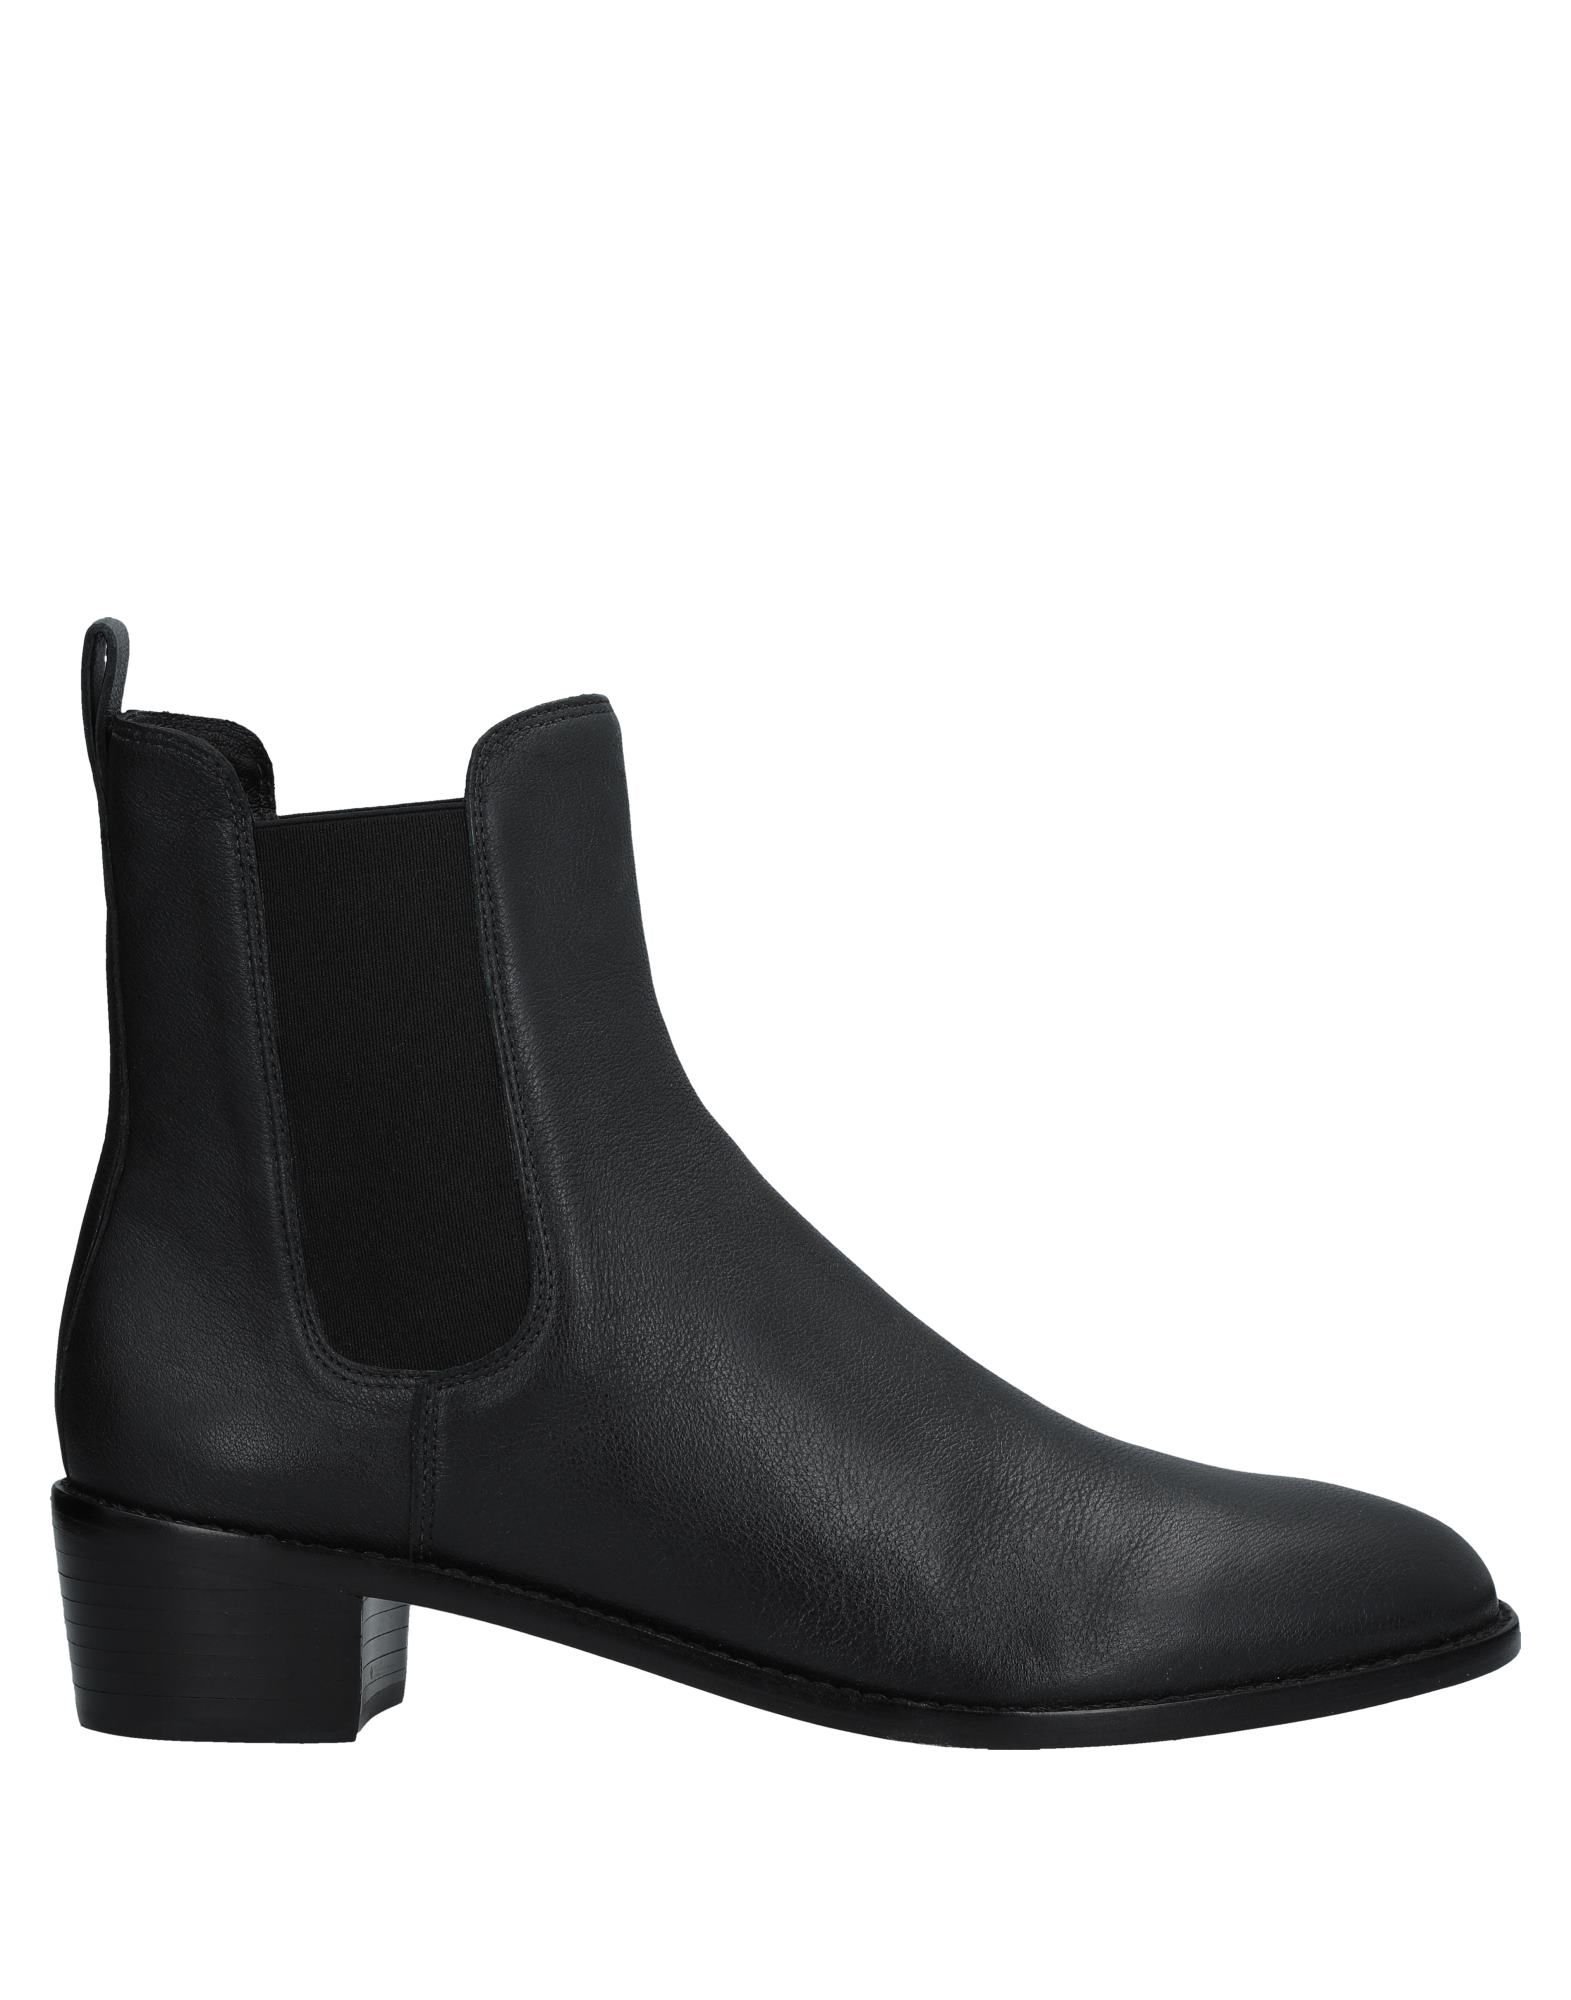 LOEFFLER RANDALL Полусапоги и высокие ботинки loeffler randall women s nicola nubuck haircalf d orsay pump